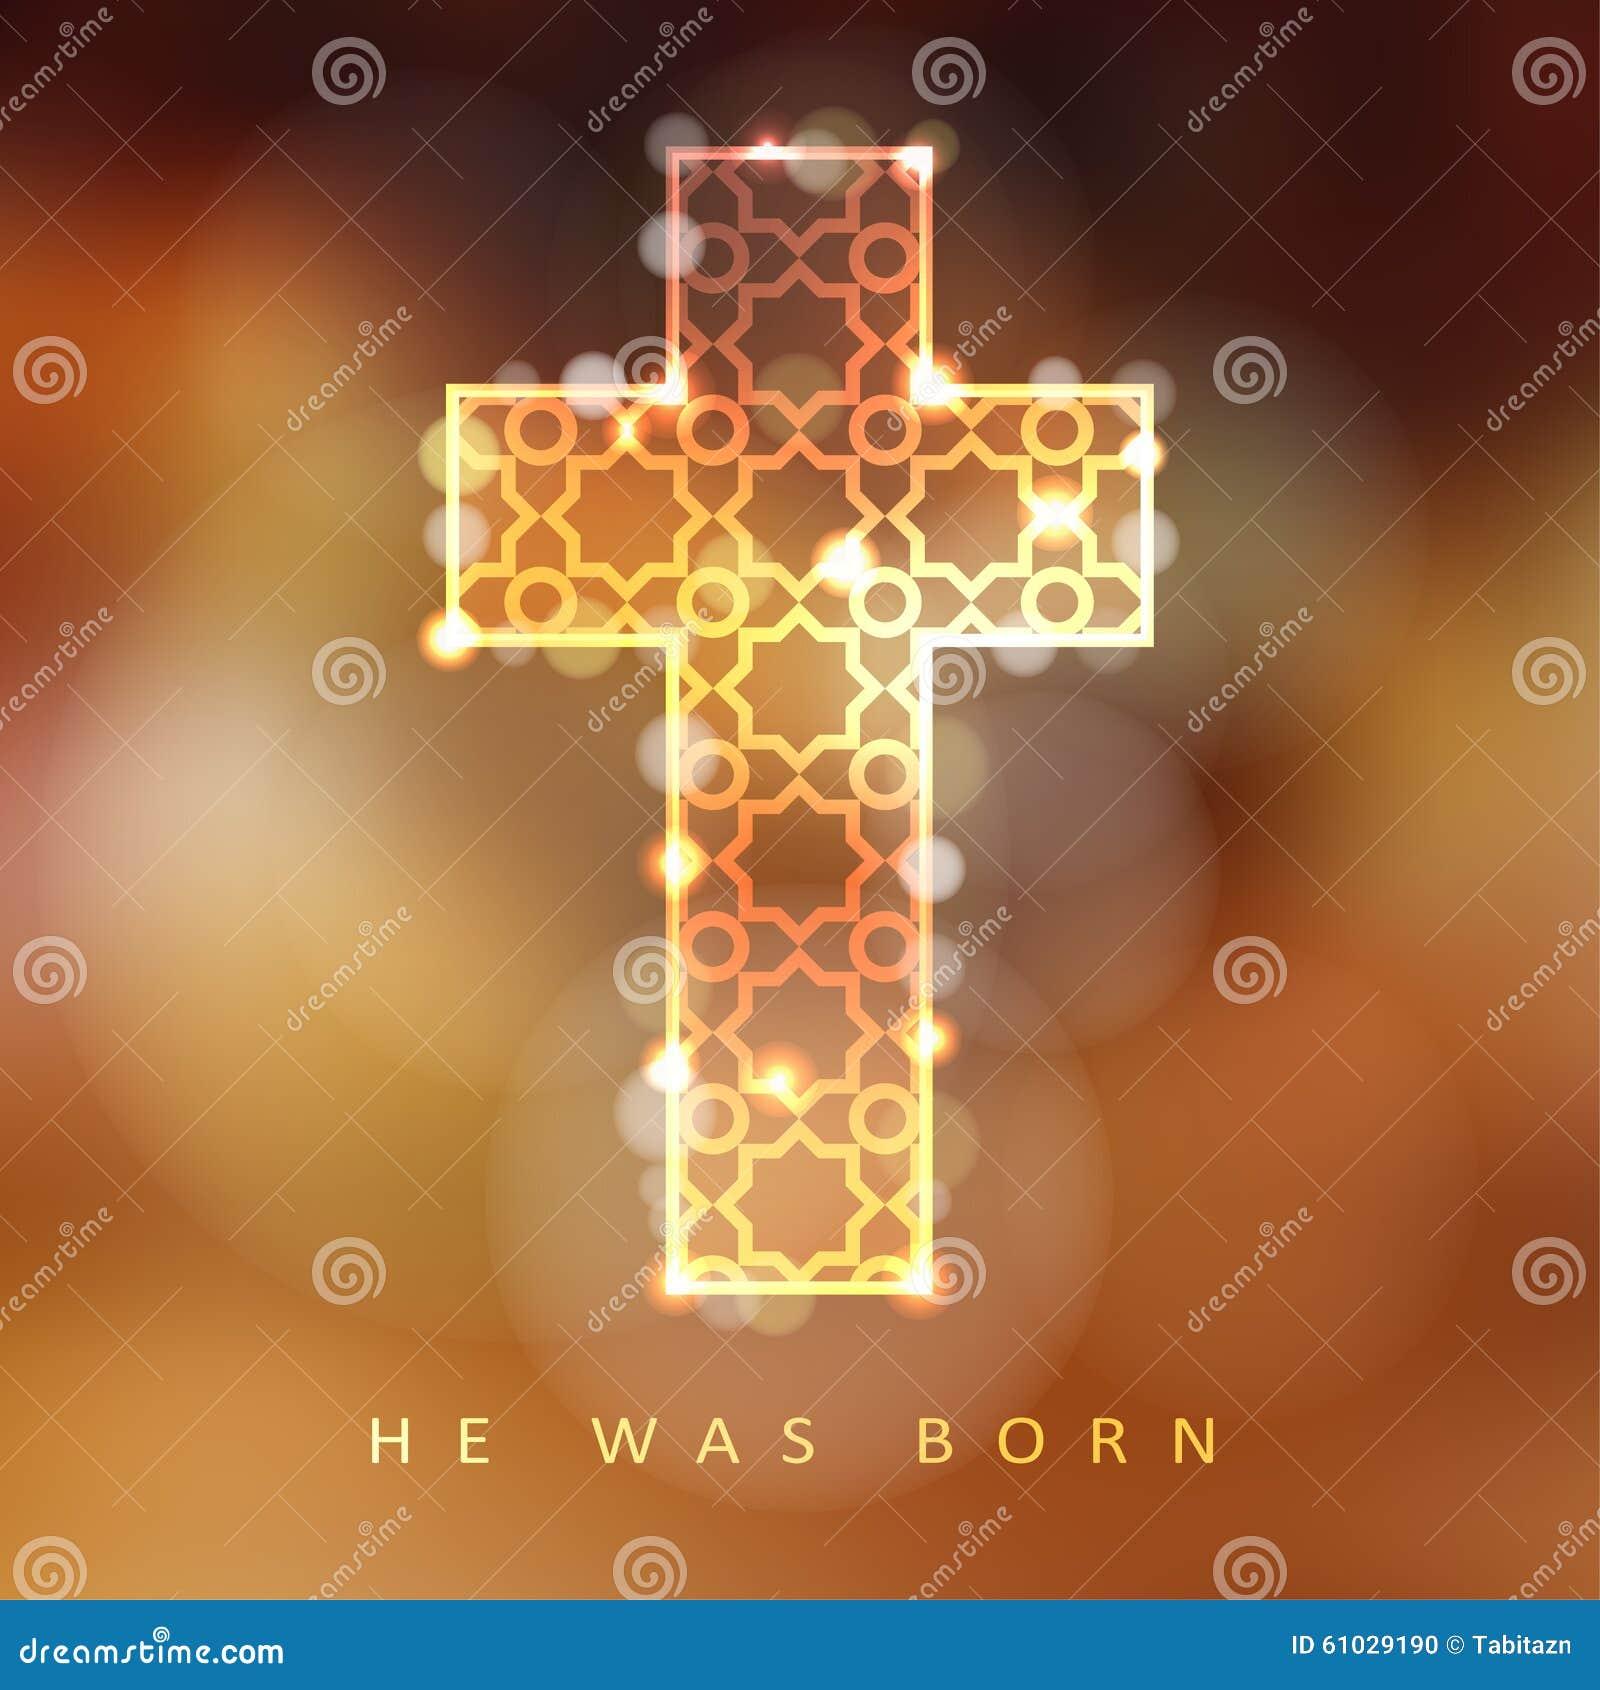 Christmas Background Christian.Christmas Background With Illuminated Ornamental Cross